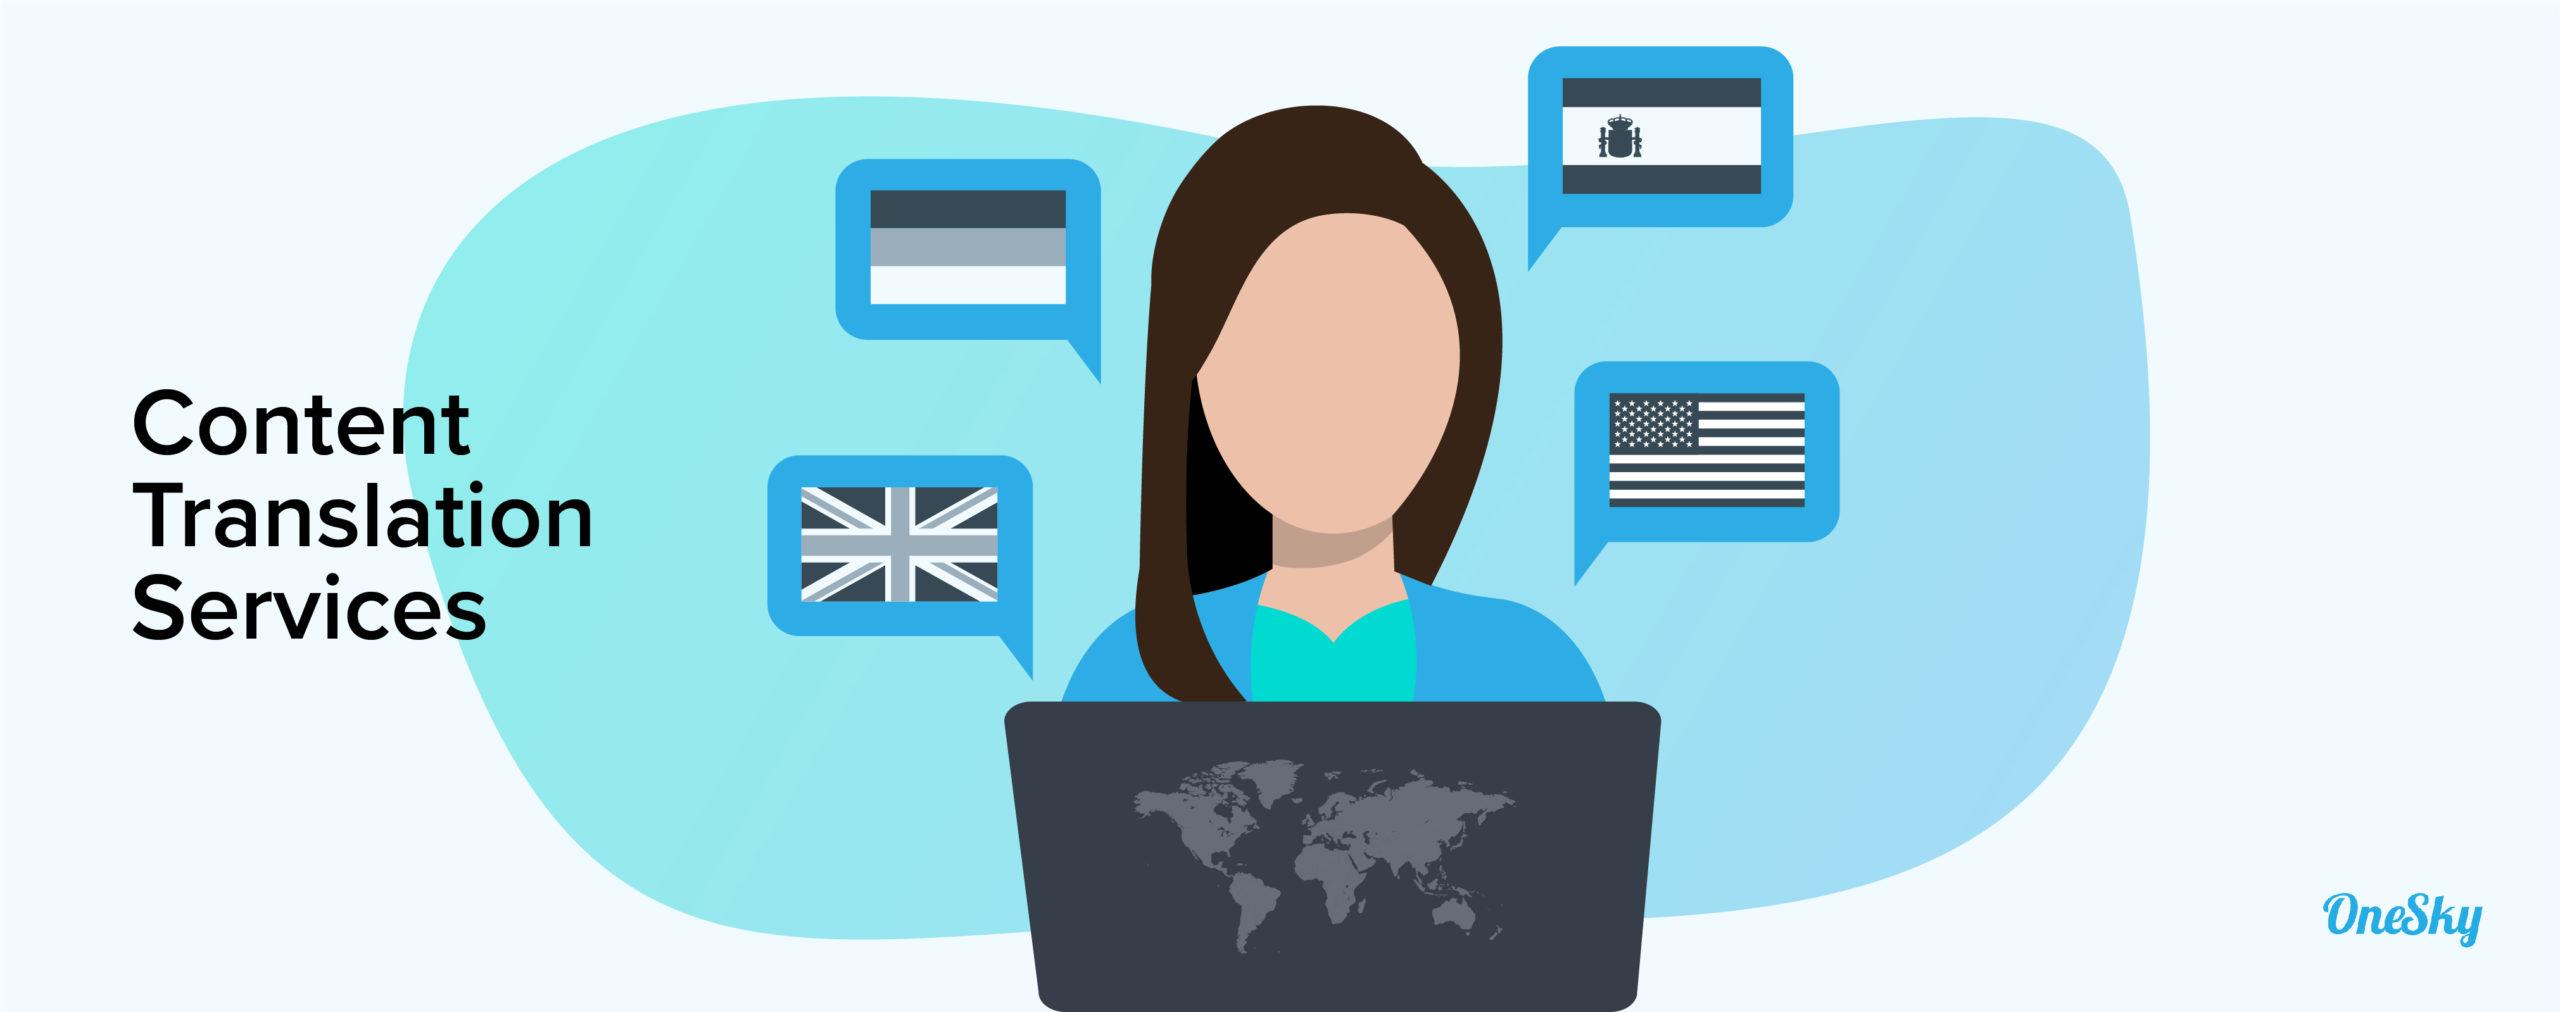 Content Translation Services